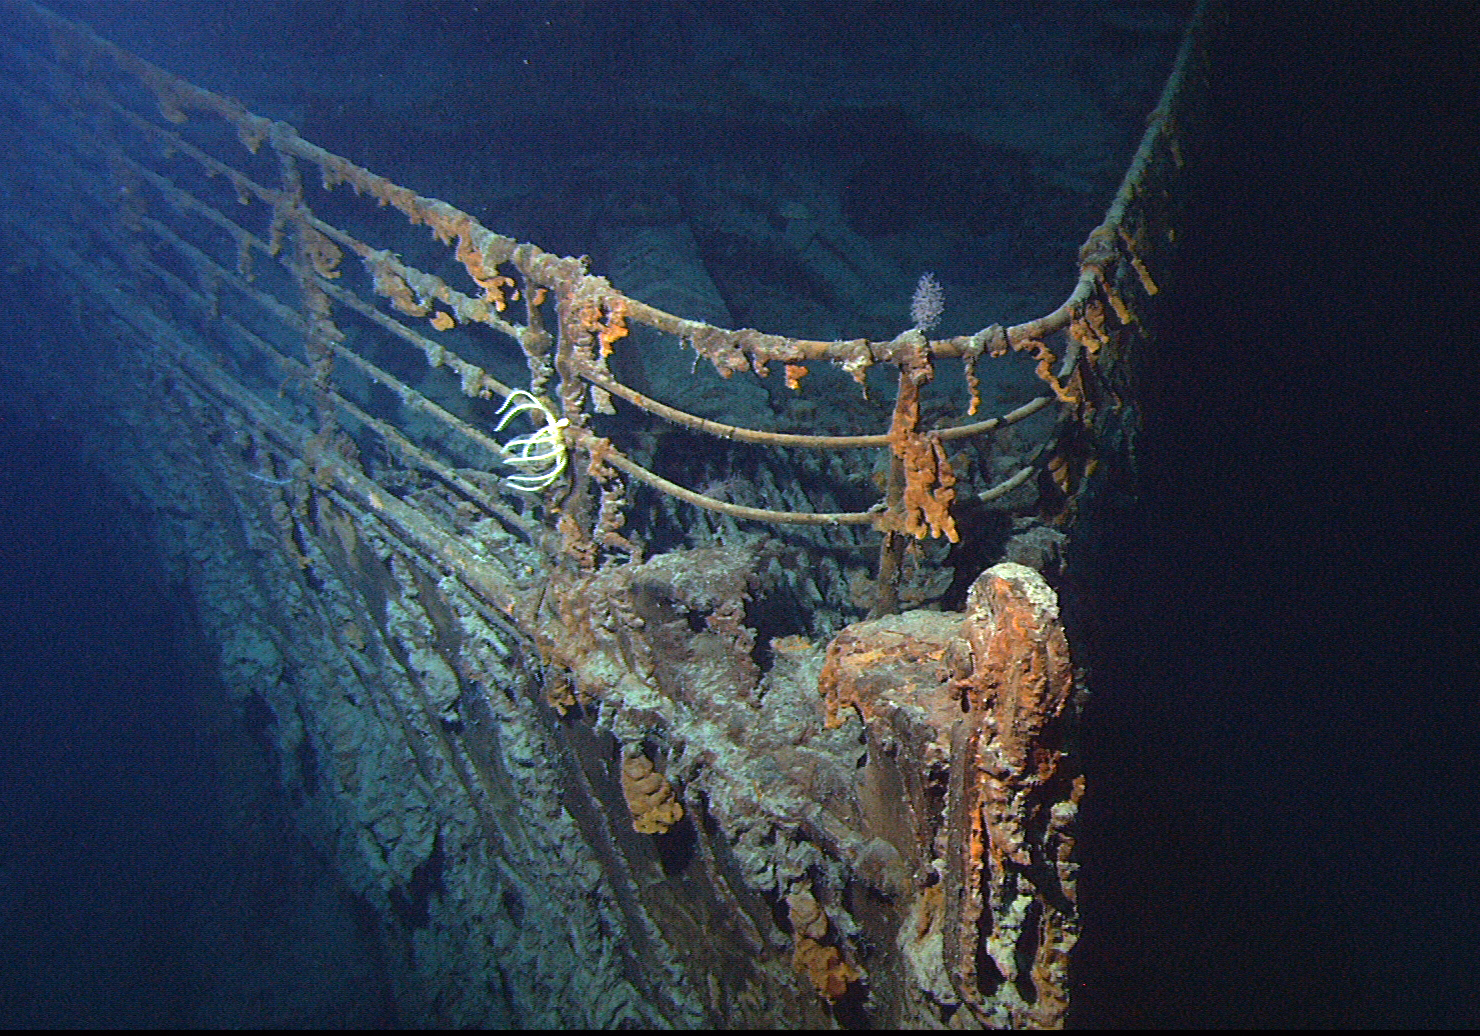 http://4.bp.blogspot.com/-T674dLsF18g/TeT3w-7M7gI/AAAAAAAAAiE/tWL8pulAOwI/s1600/titanic_bow_2004.jpg